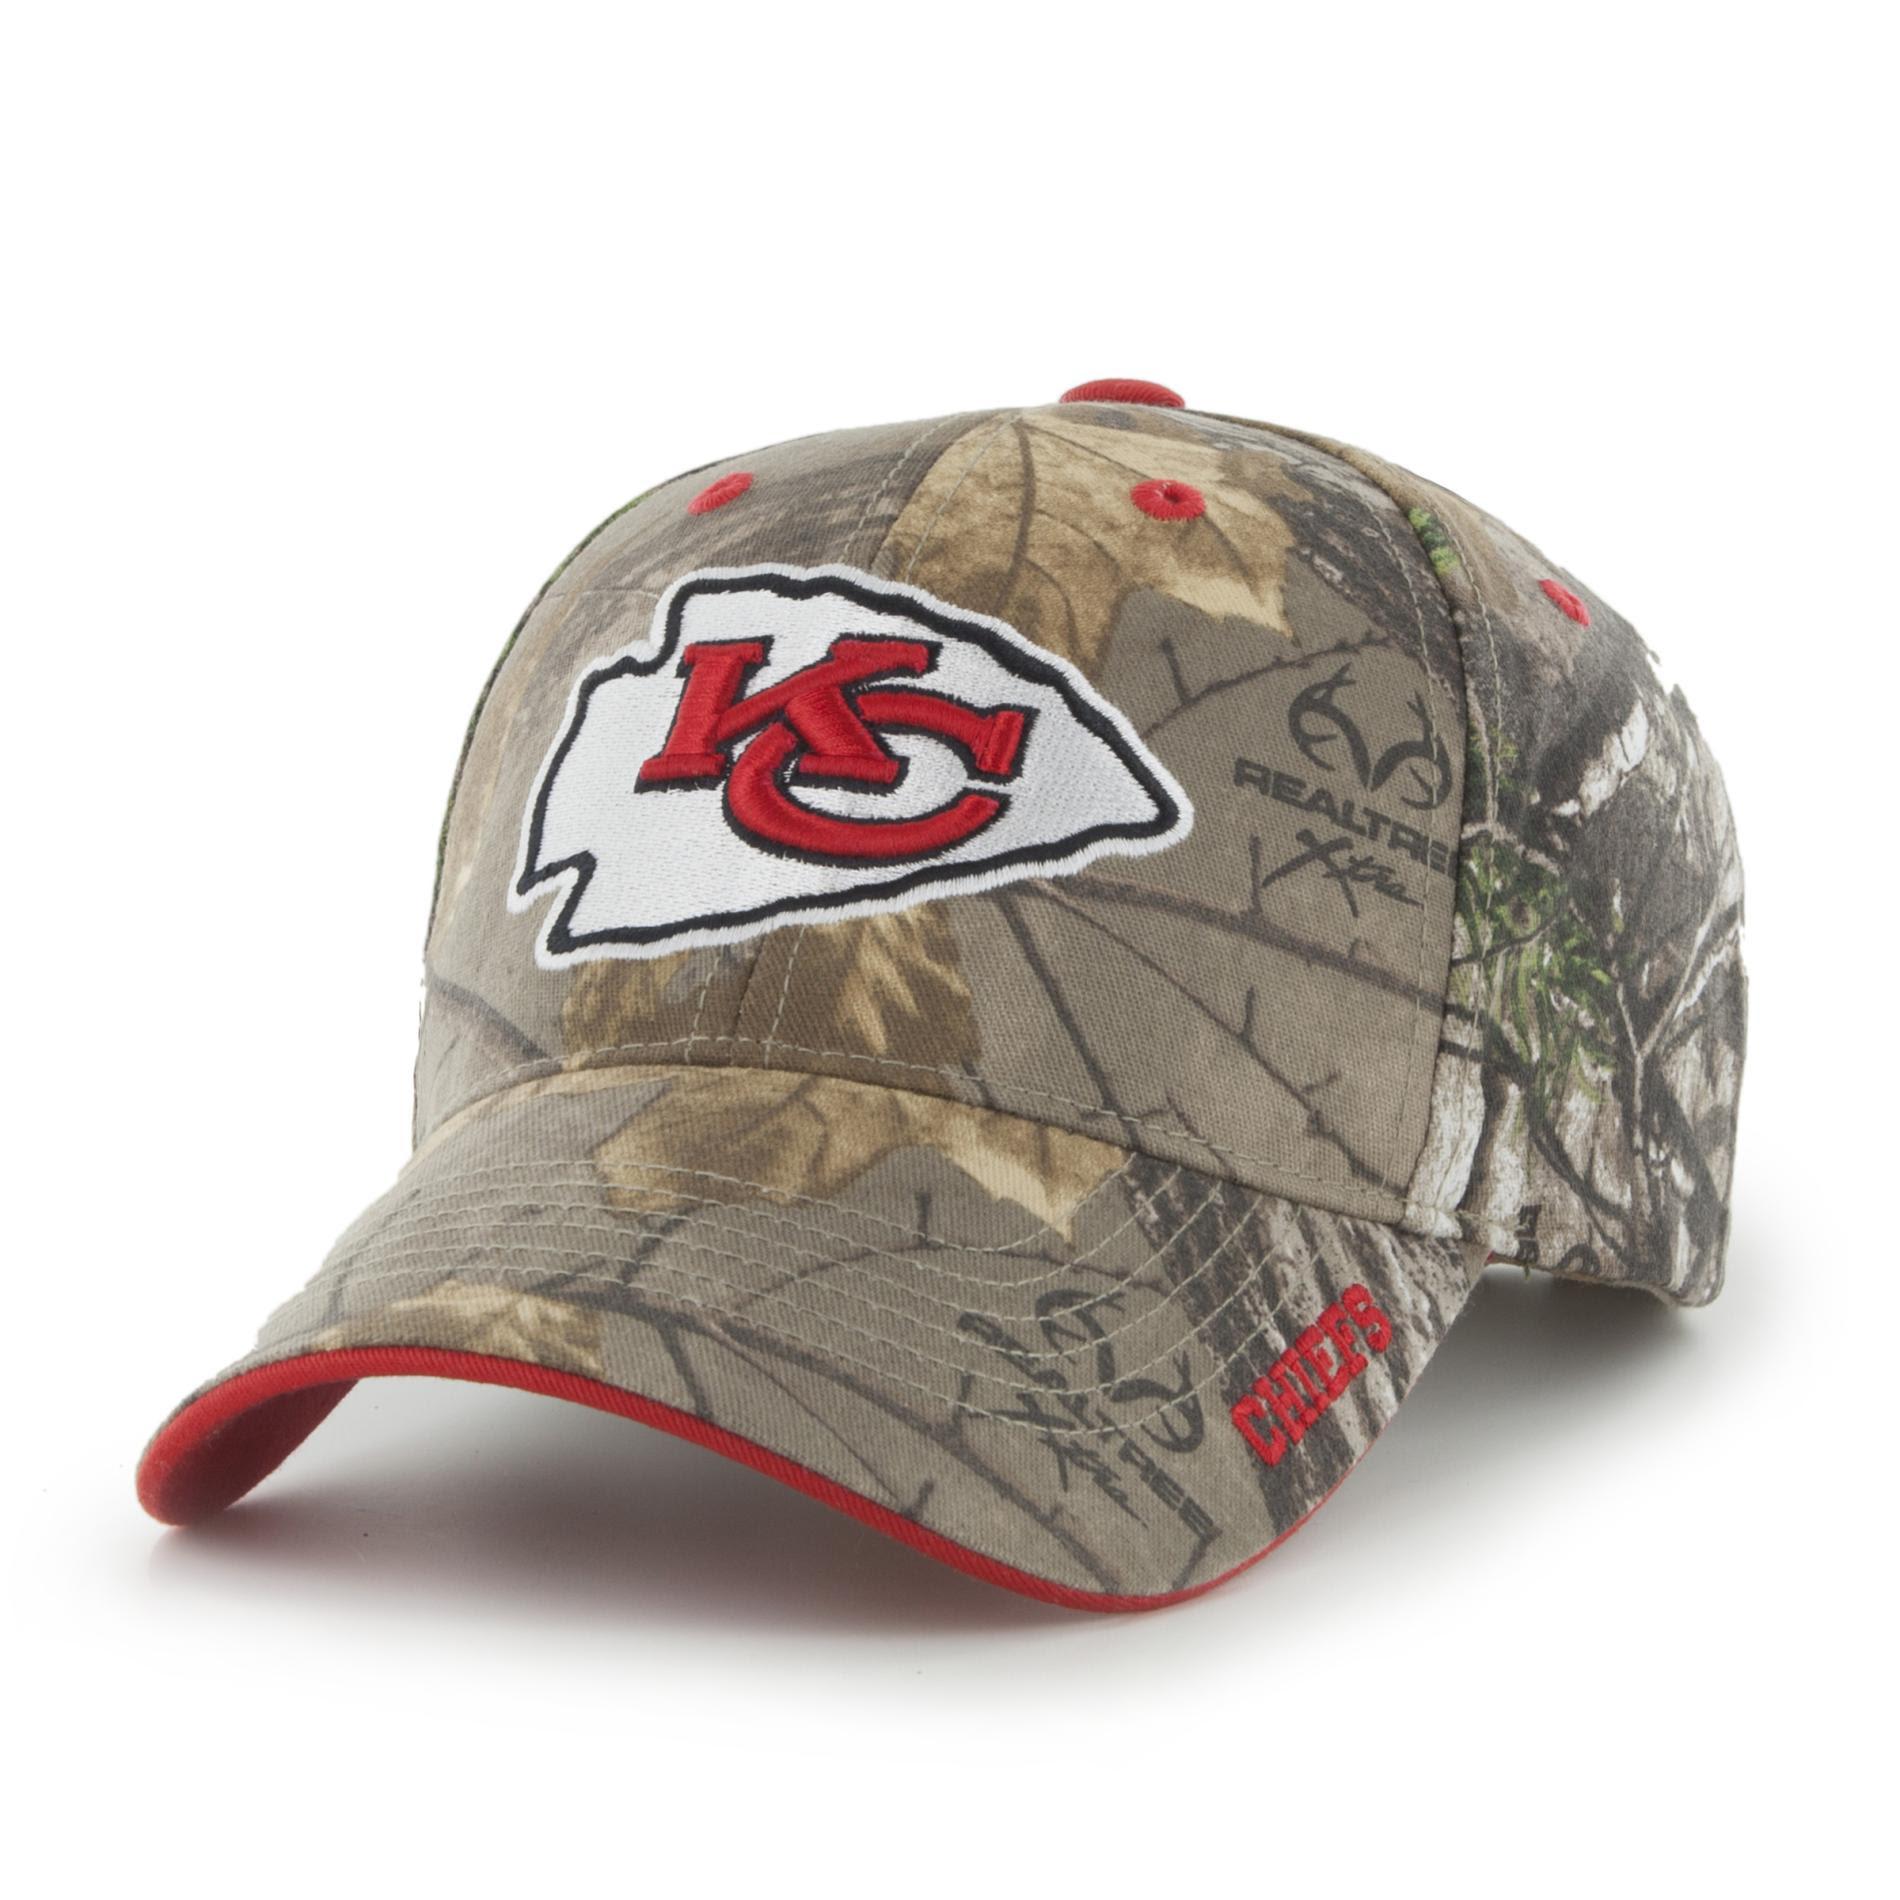 NFL Mens Camo Baseball Hat  Kansas City Chiefs  Kmart